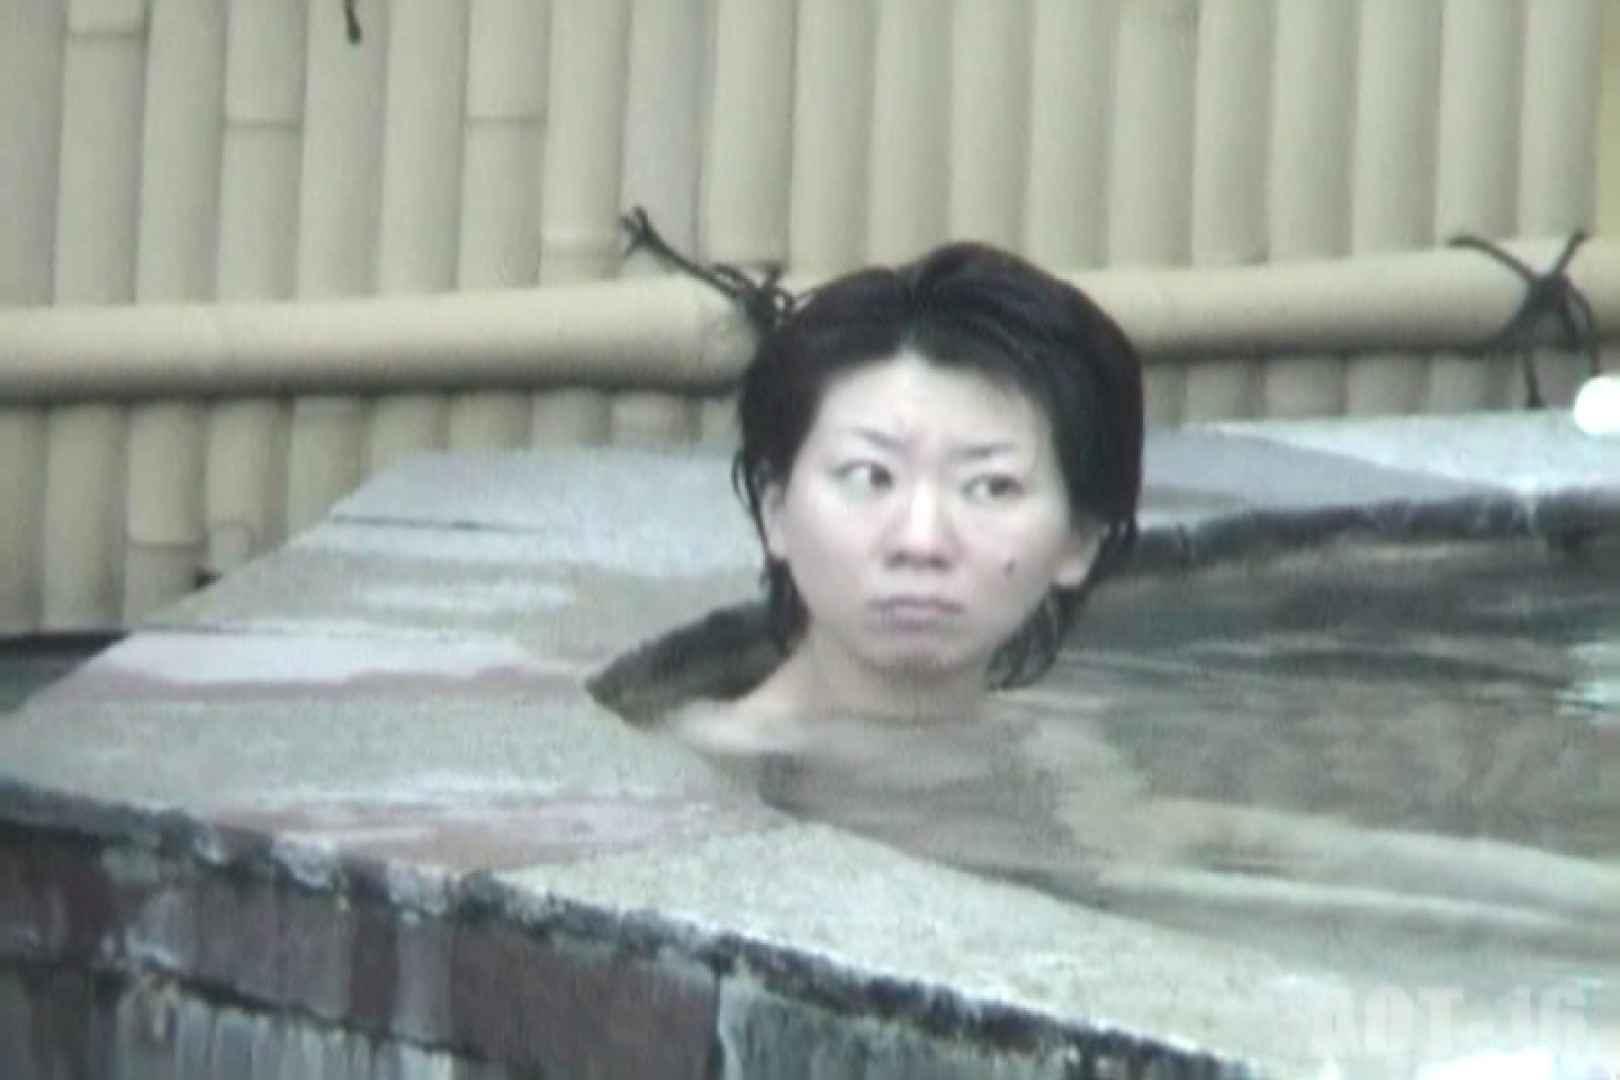 Aquaな露天風呂Vol.842 盗撮  44連発 3